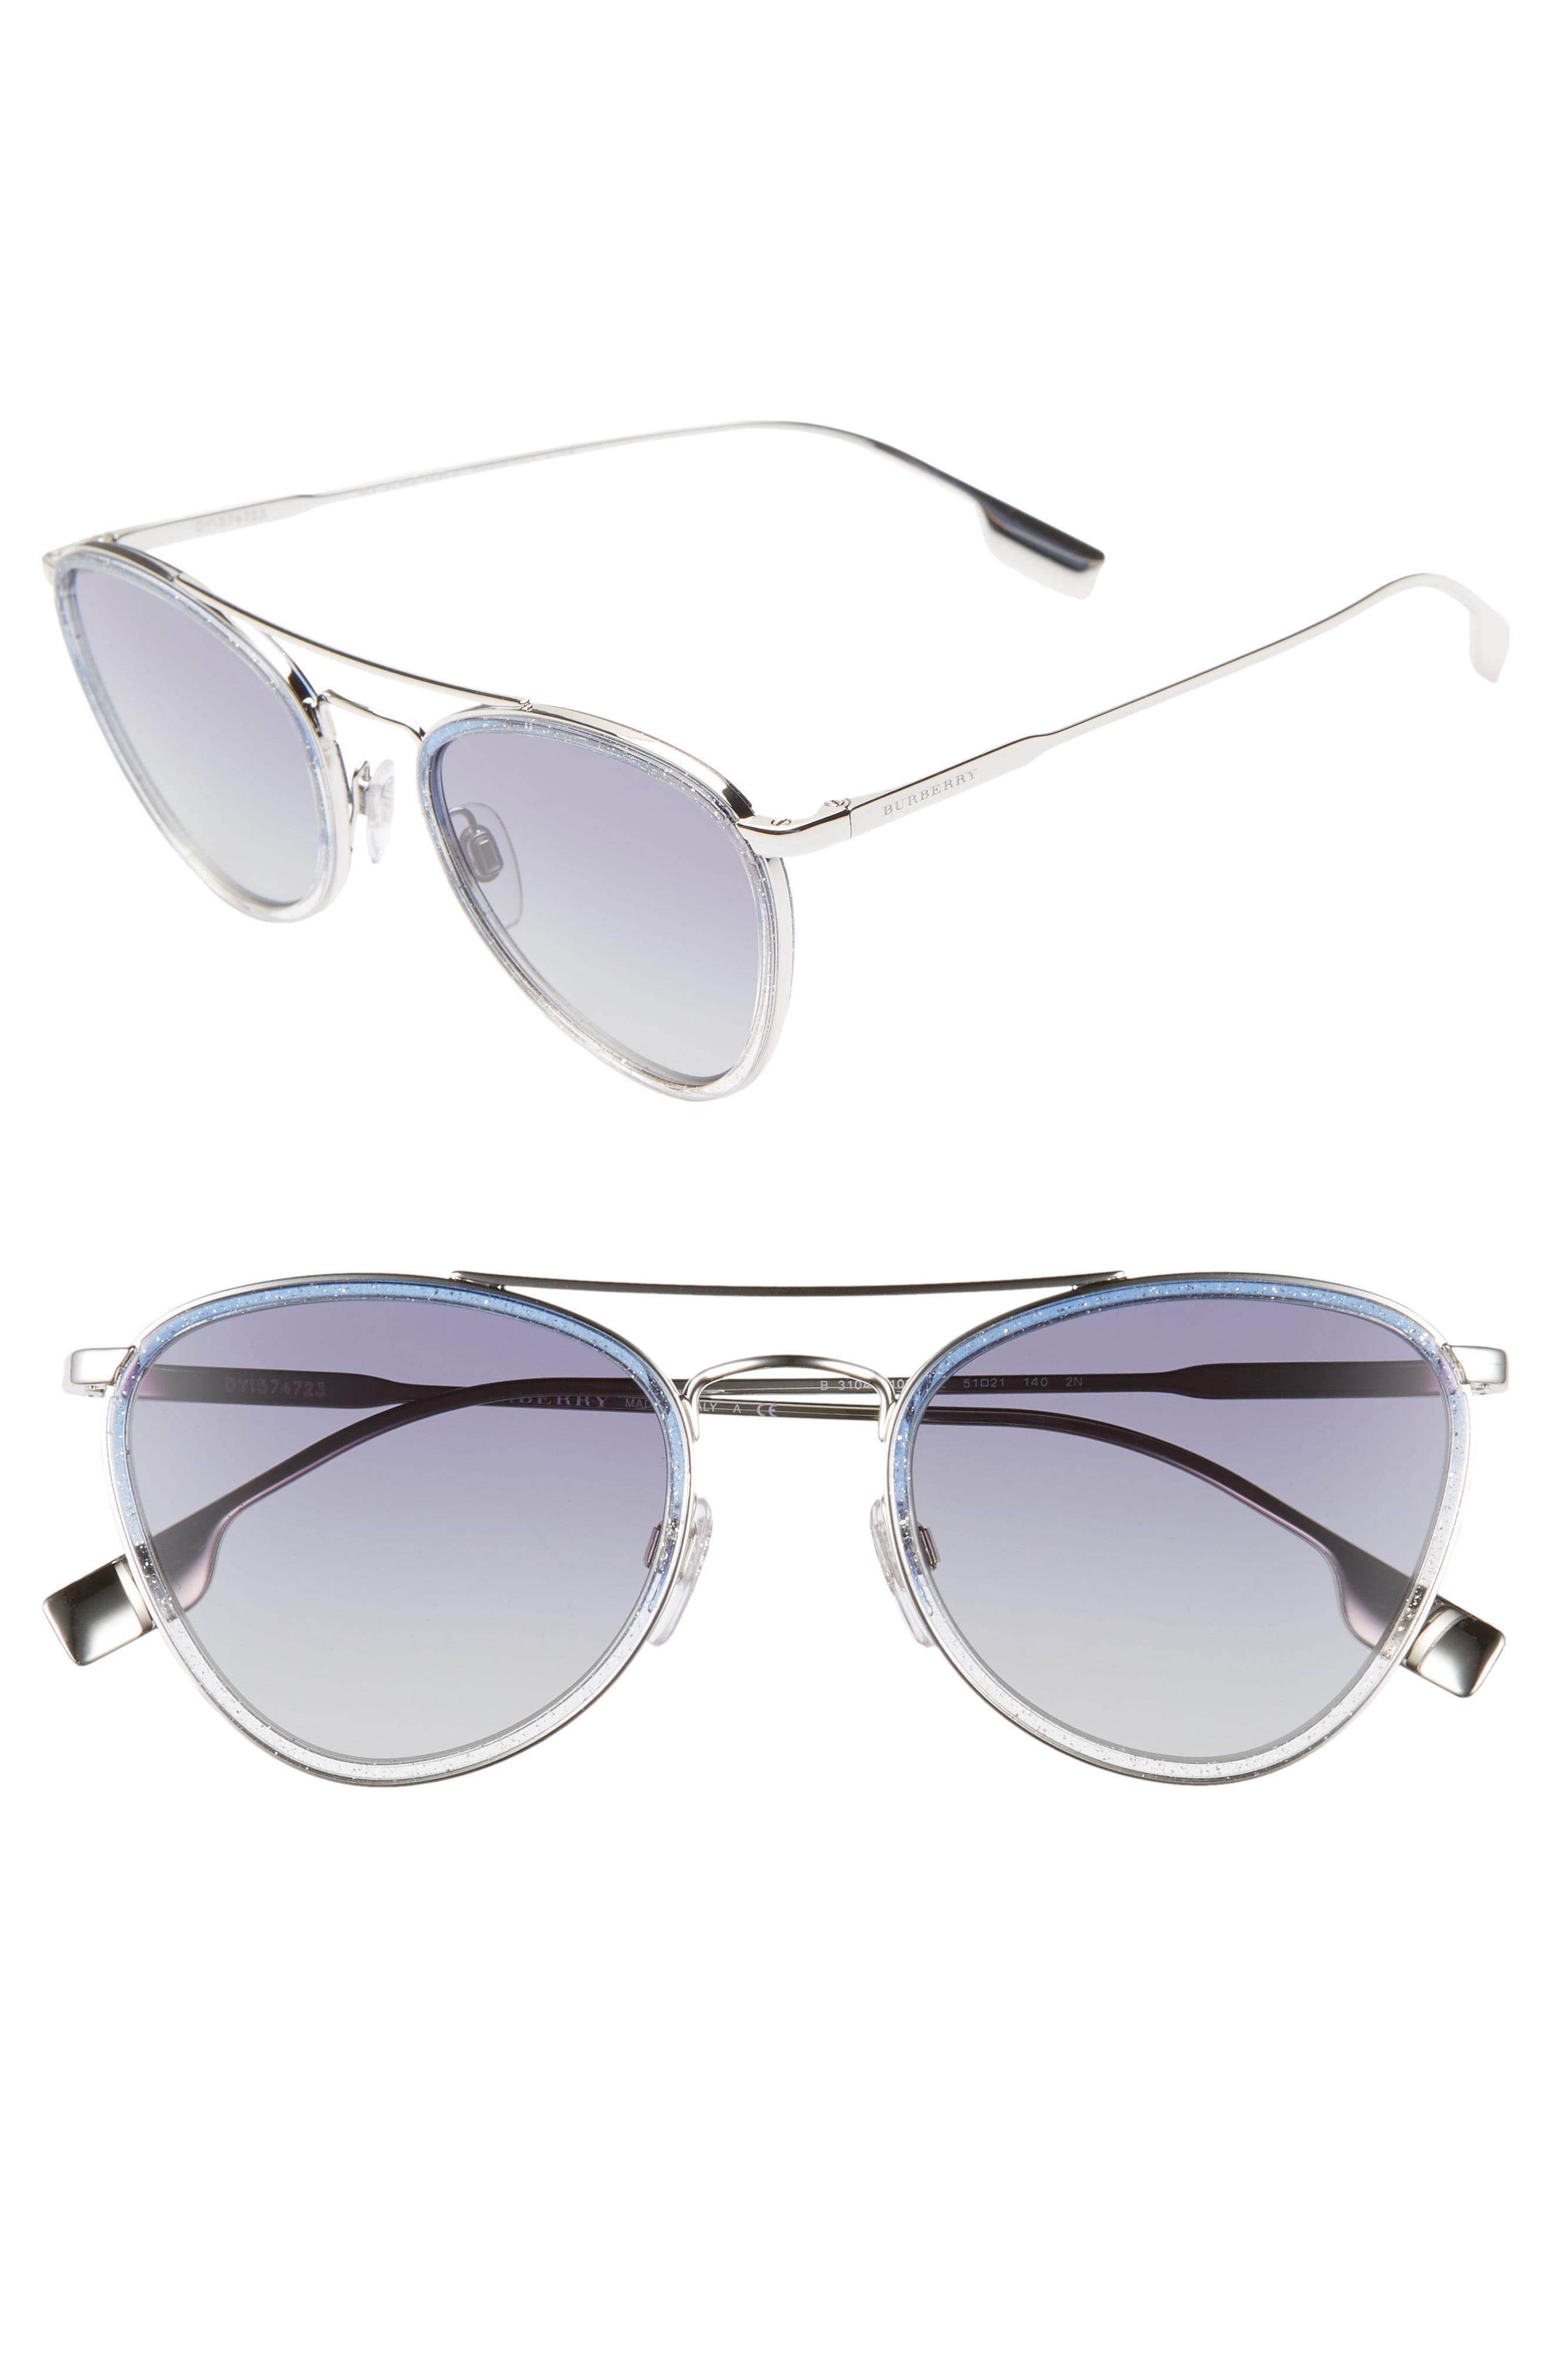 364e0cb685bde Lyst - Burberry 51mm Aviator Sunglasses in Metallic